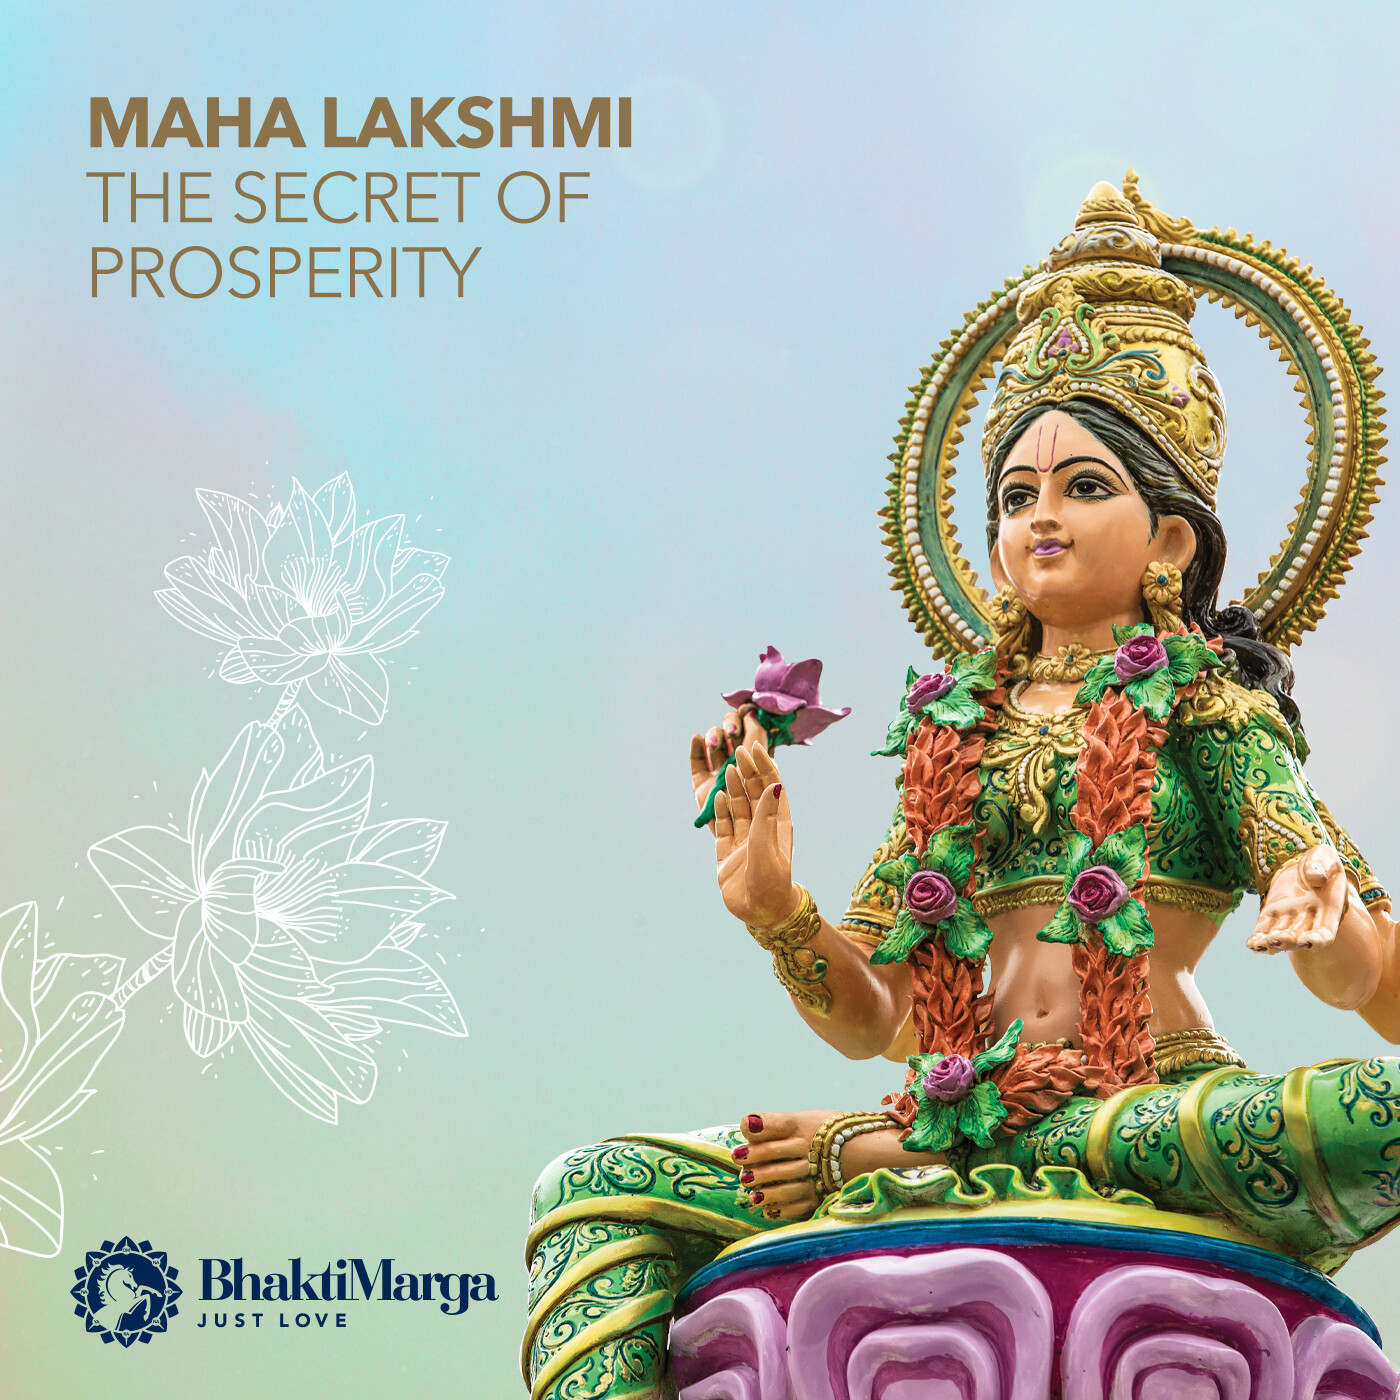 Maha Lakshmi: The Secret of Prosperity